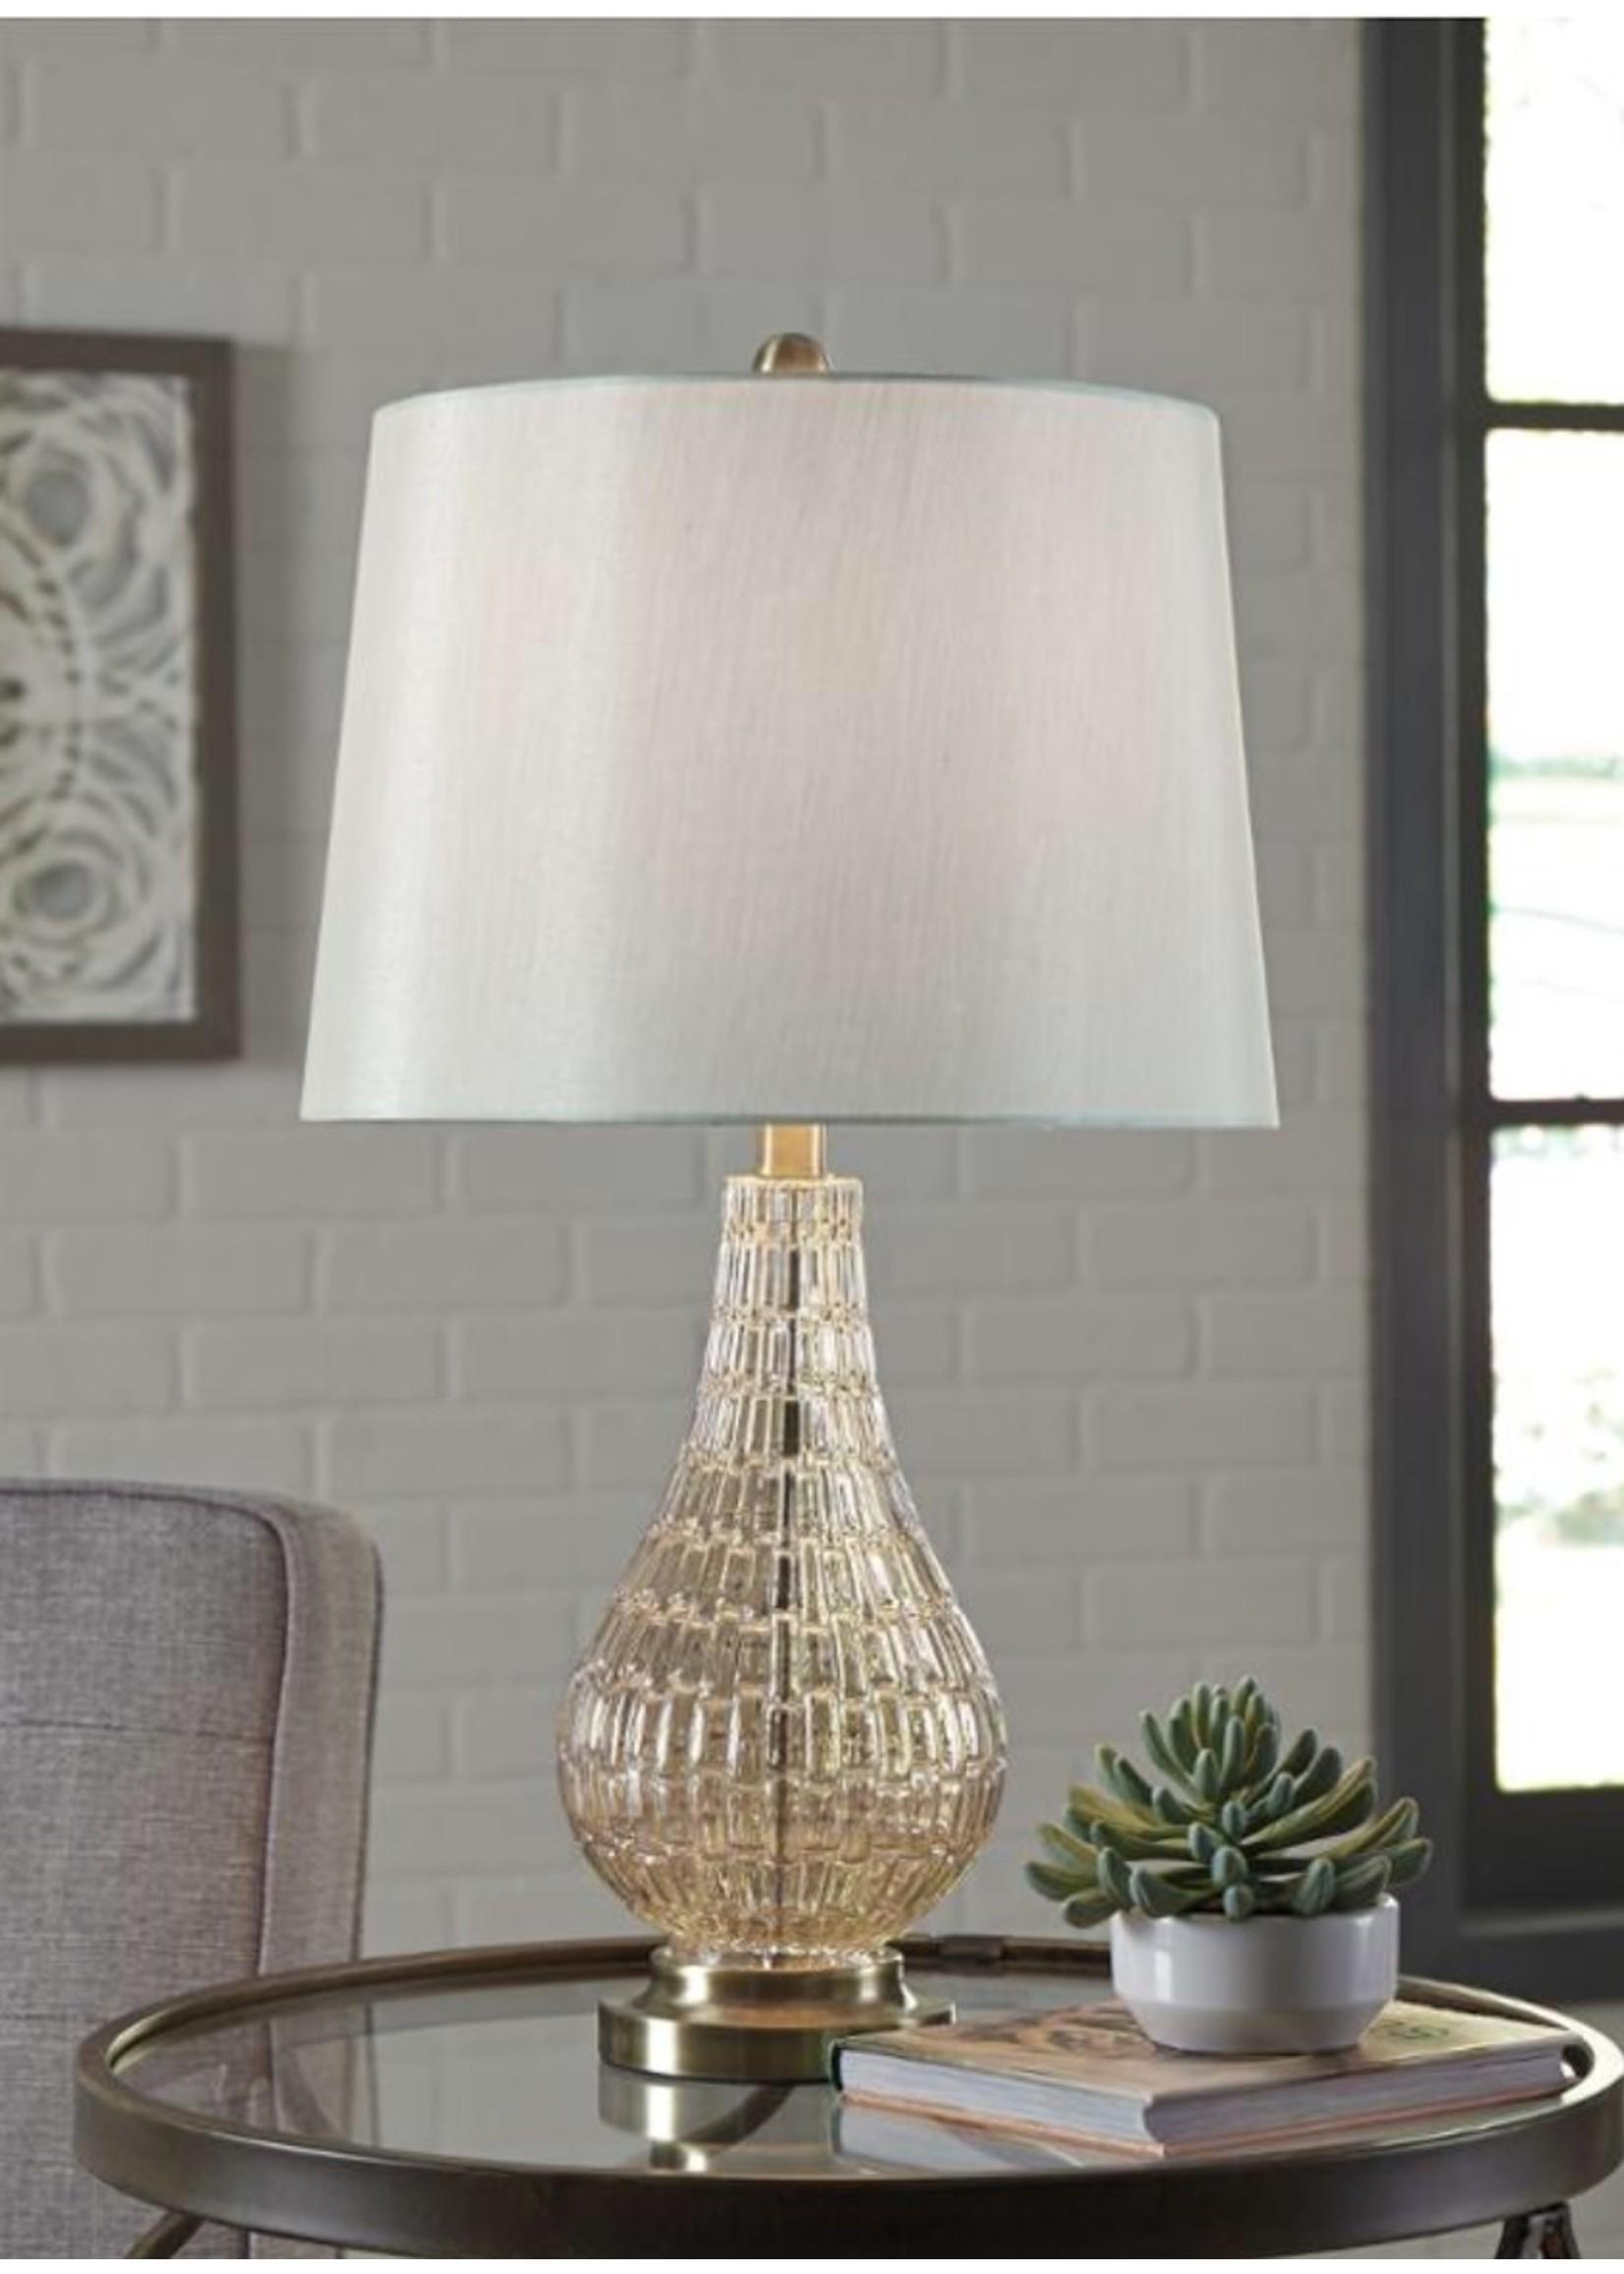 ASHLEY LATOYA TABLE LAMP IN CHAMPAGNE